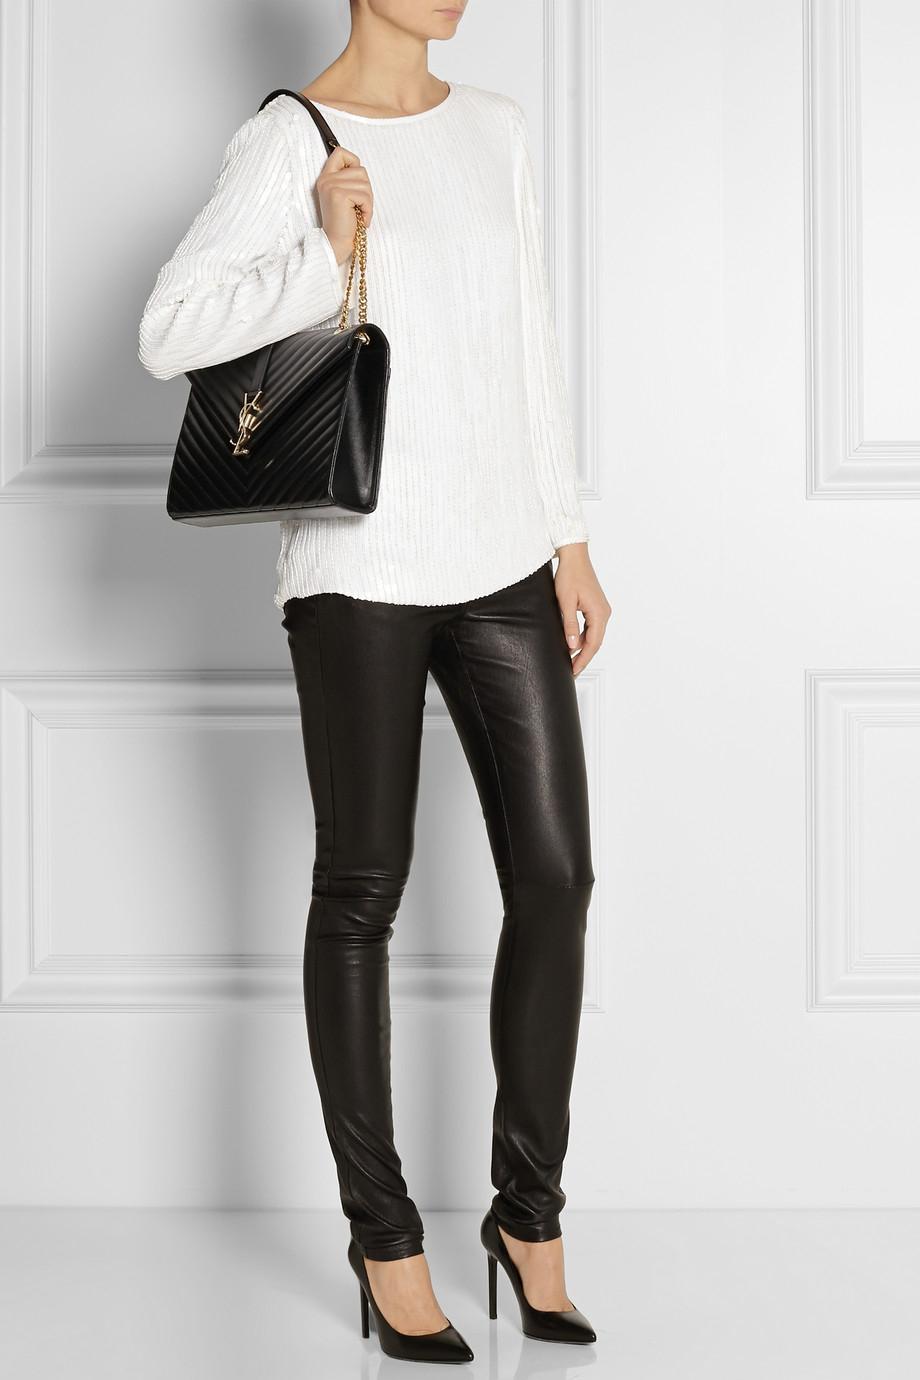 Saint Laurent Women S Monogram Medium Shoulder Bag In